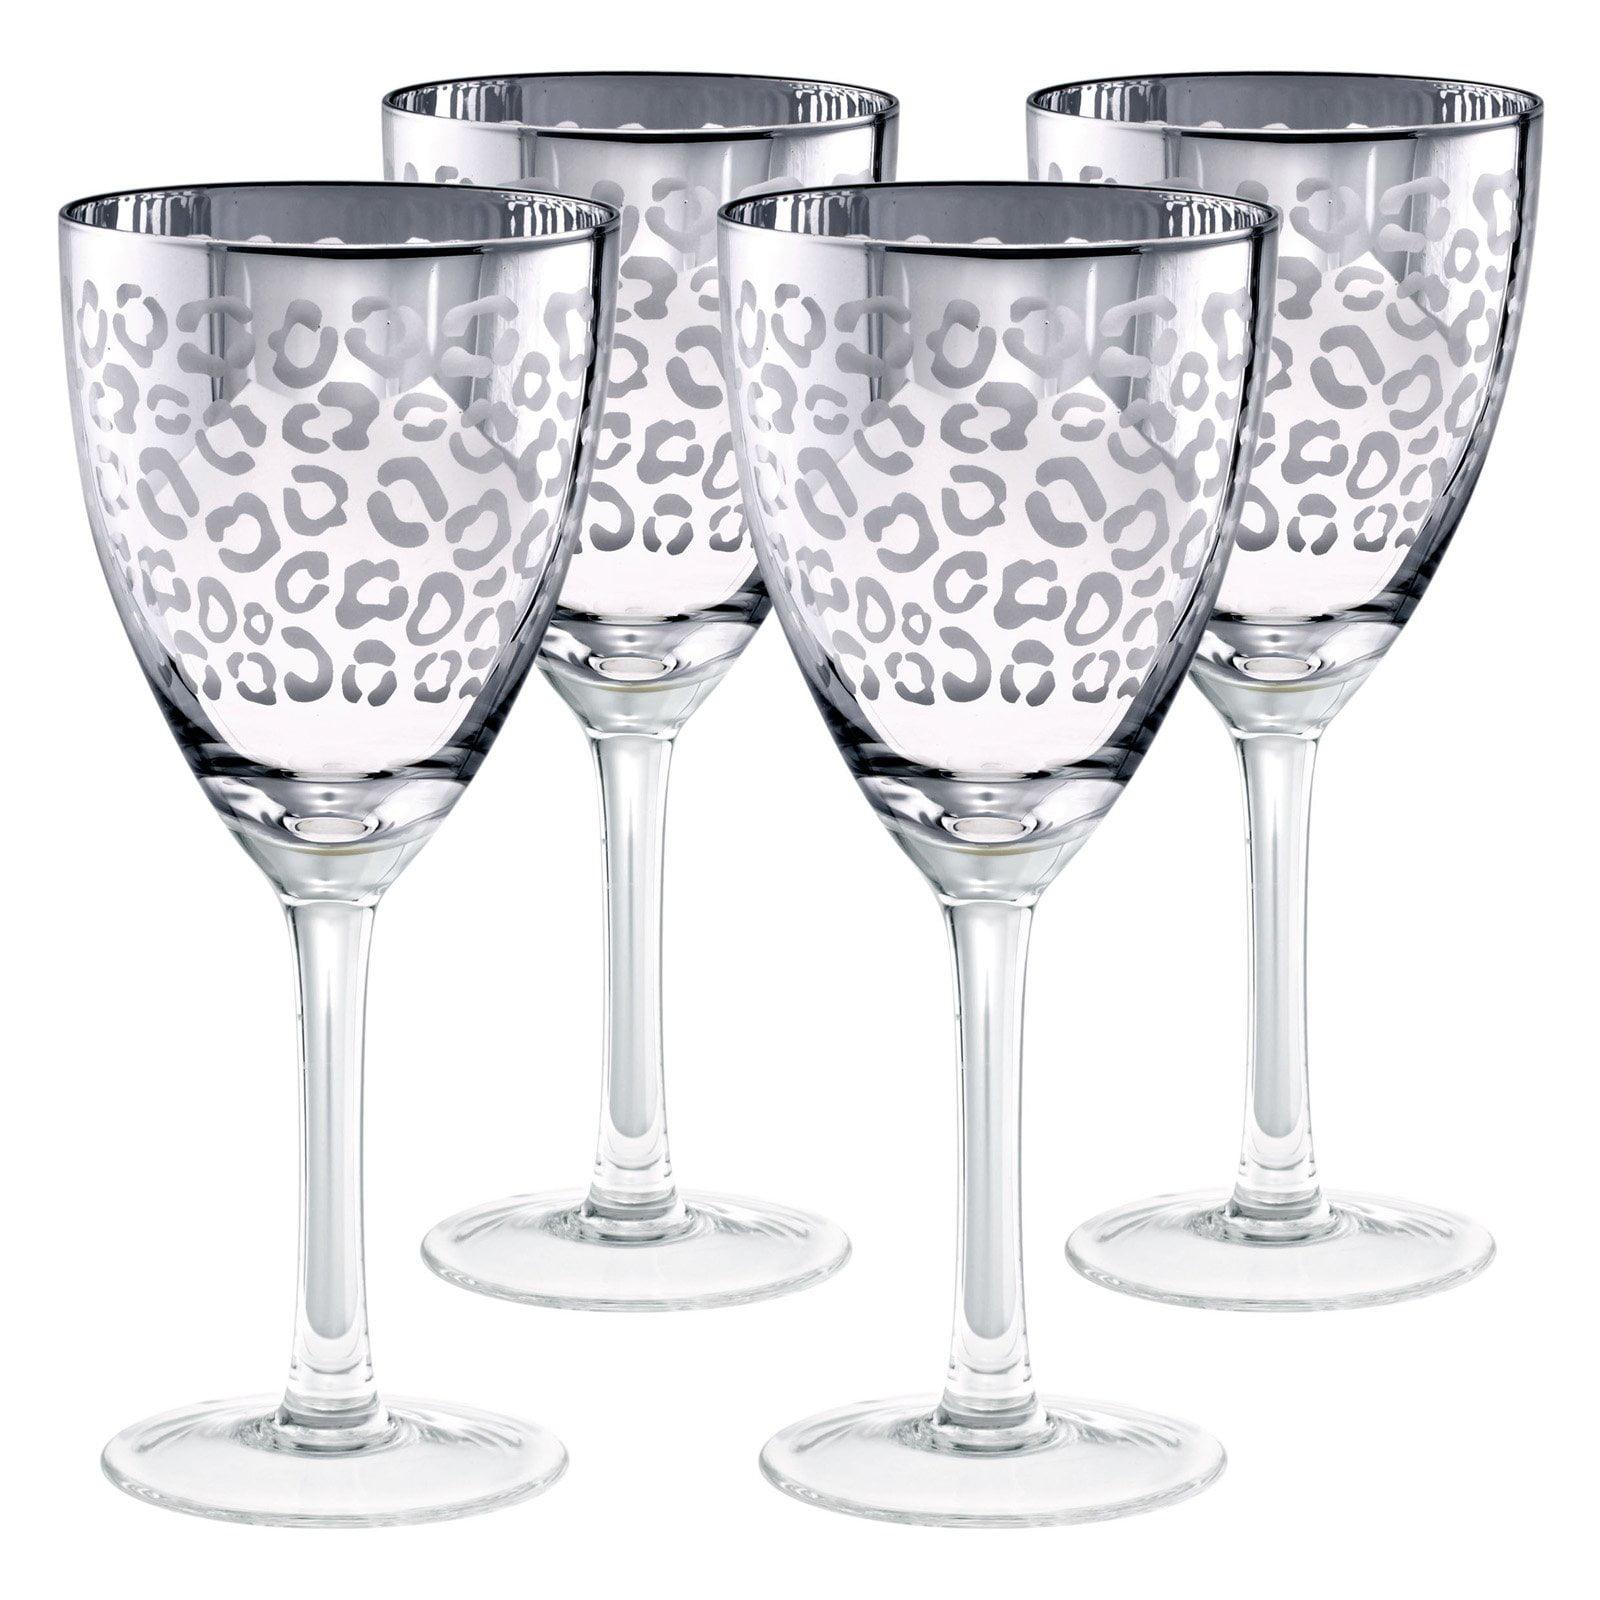 Artland Inc. Leopard Silver Wine Glasses Set of 4 by Artland